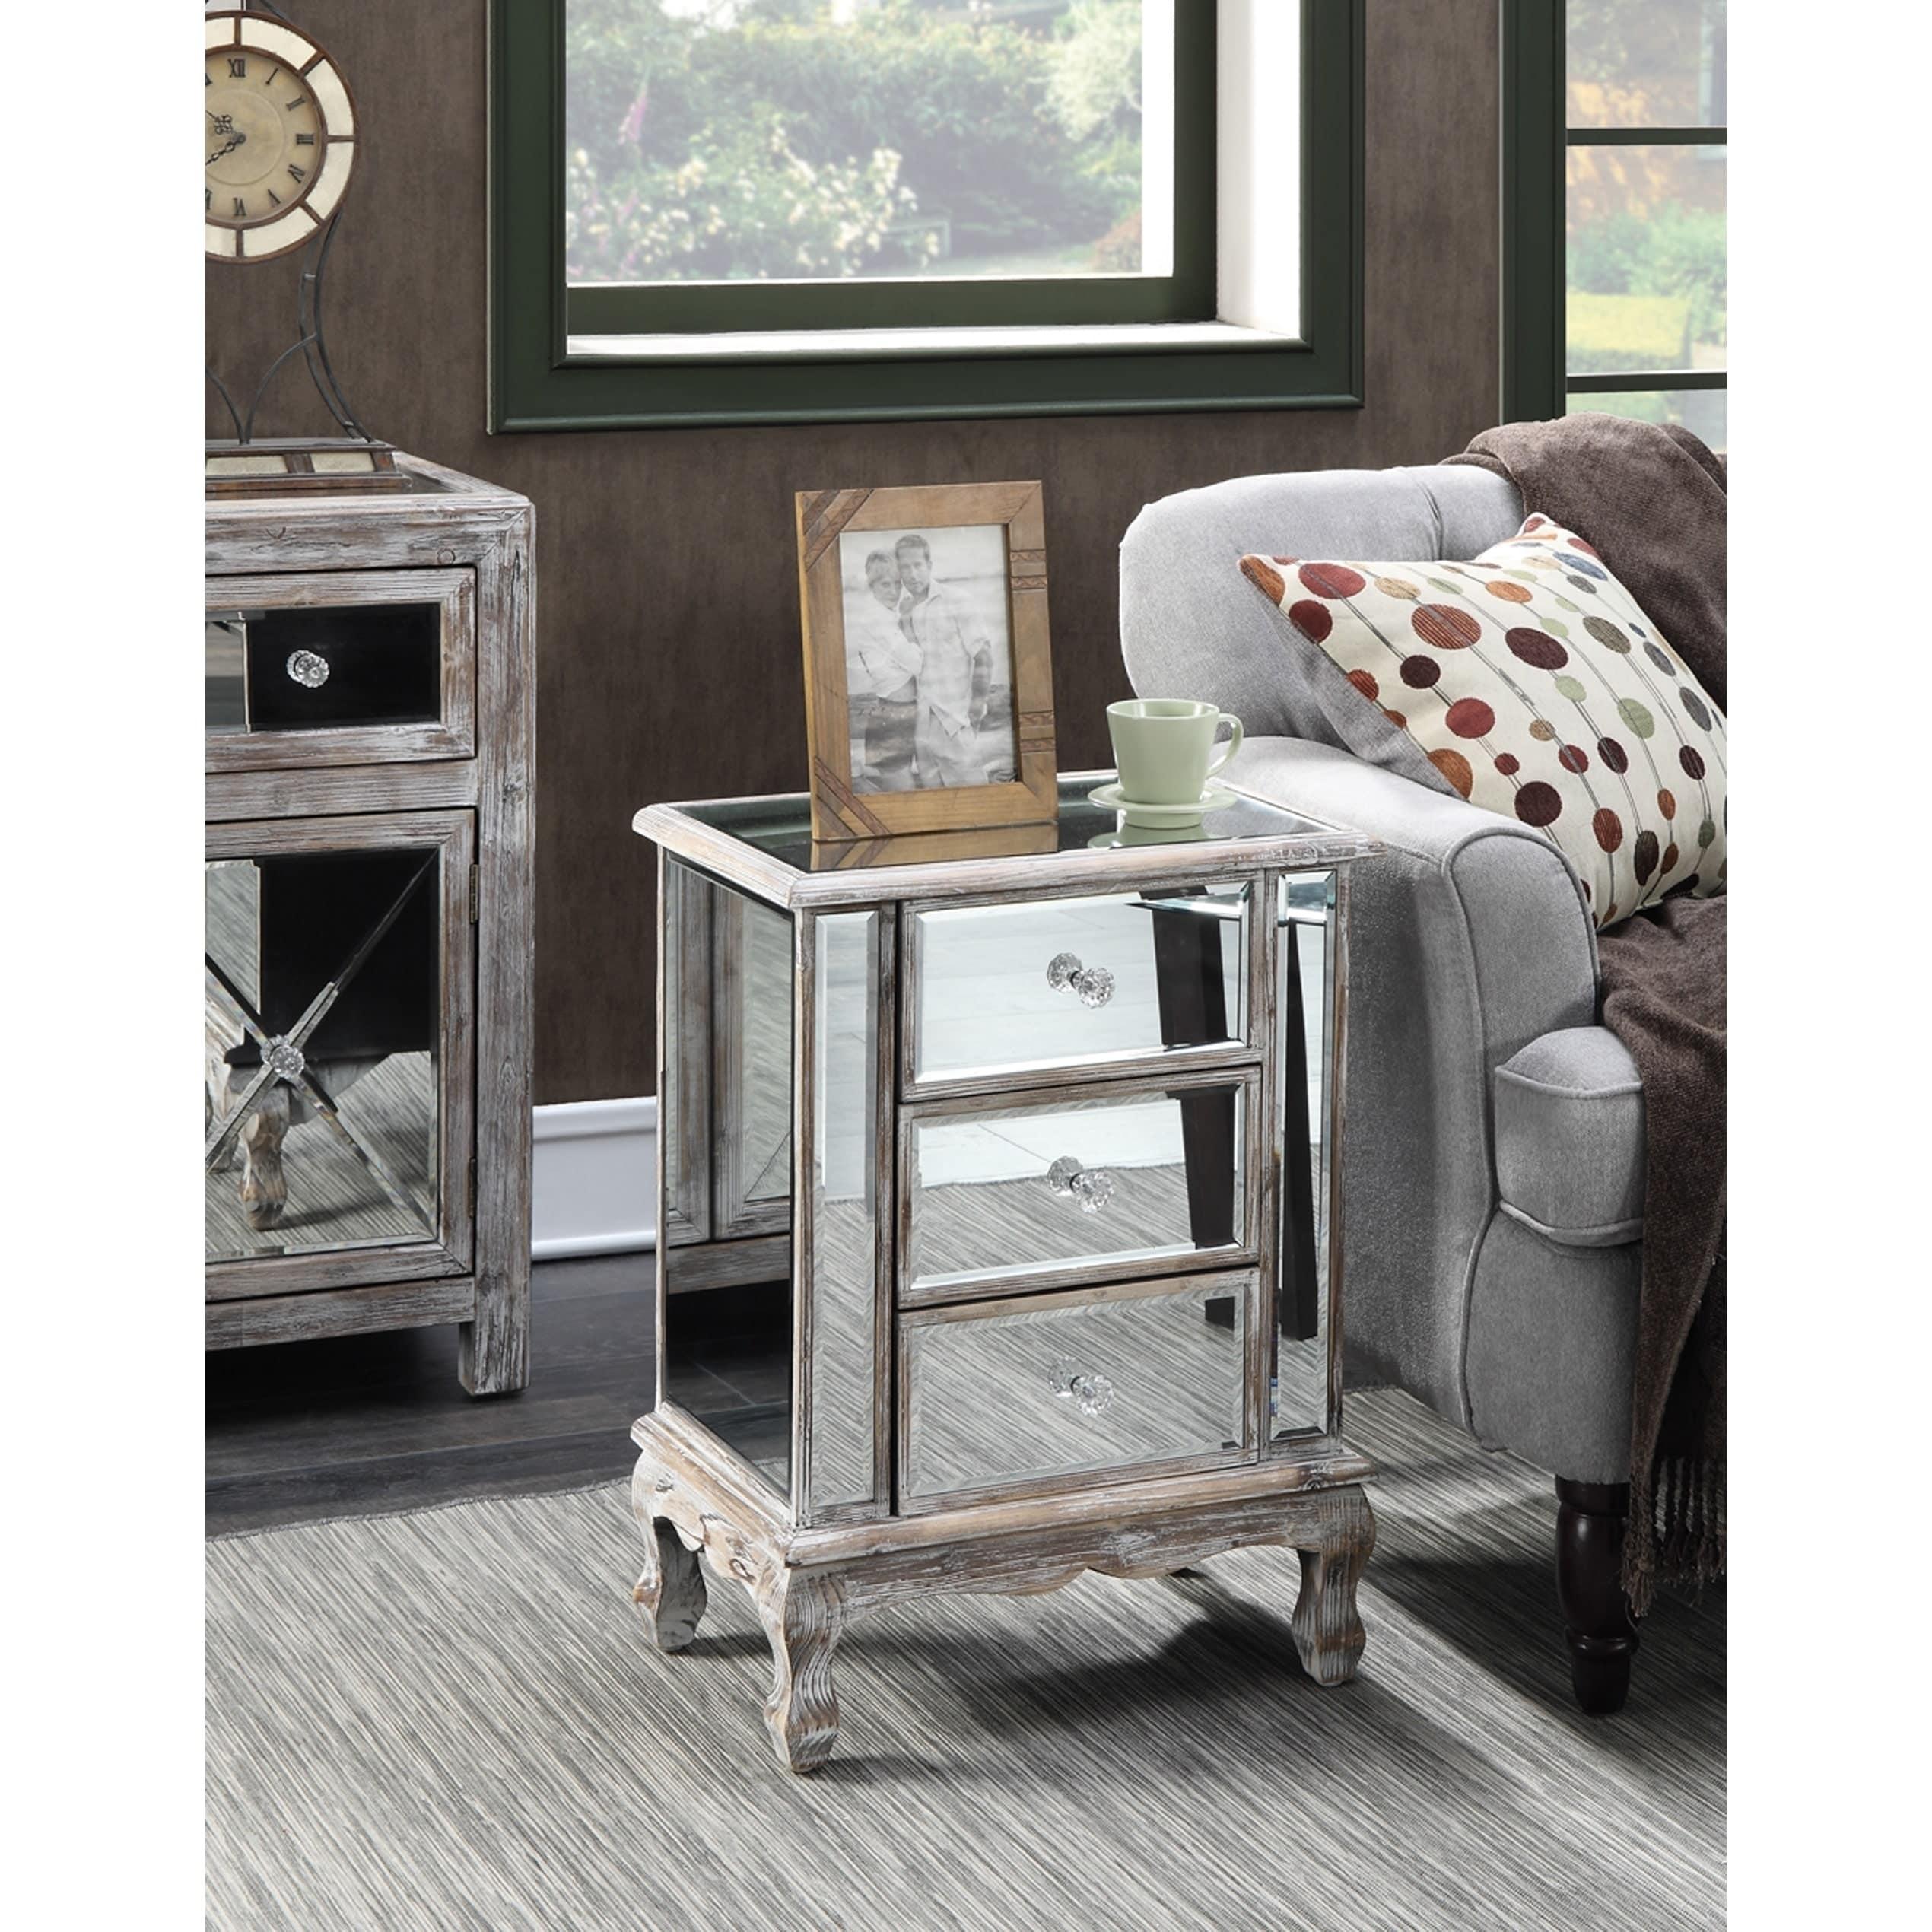 Victorian Living Room Furniture   Find Great Furniture Deals ...